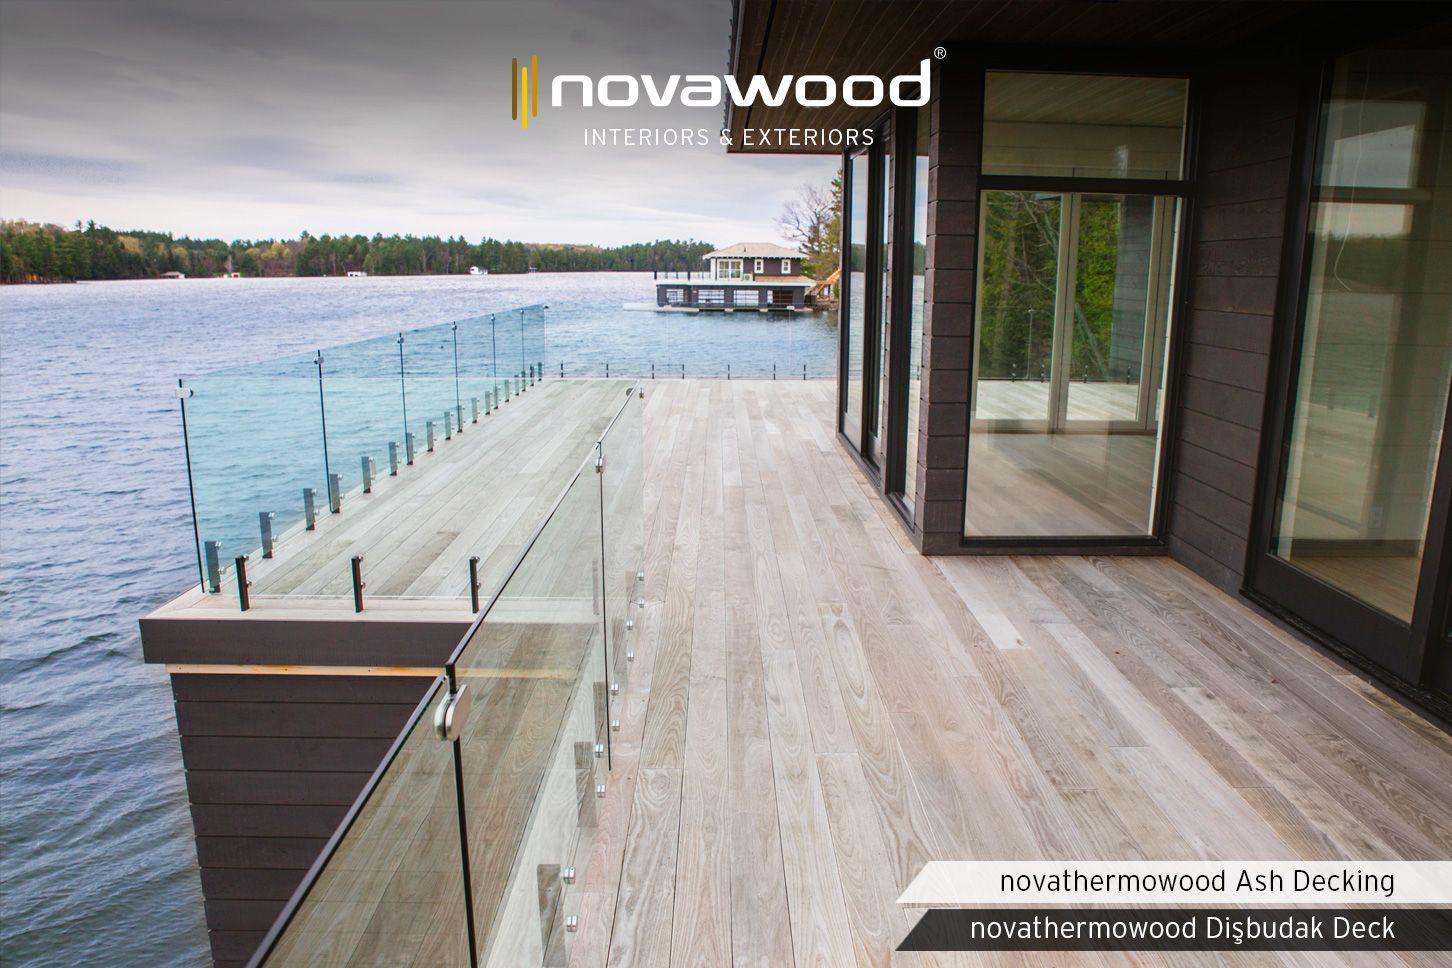 Material Used: Novathermowood Ash Decking #northamerica #novawood #